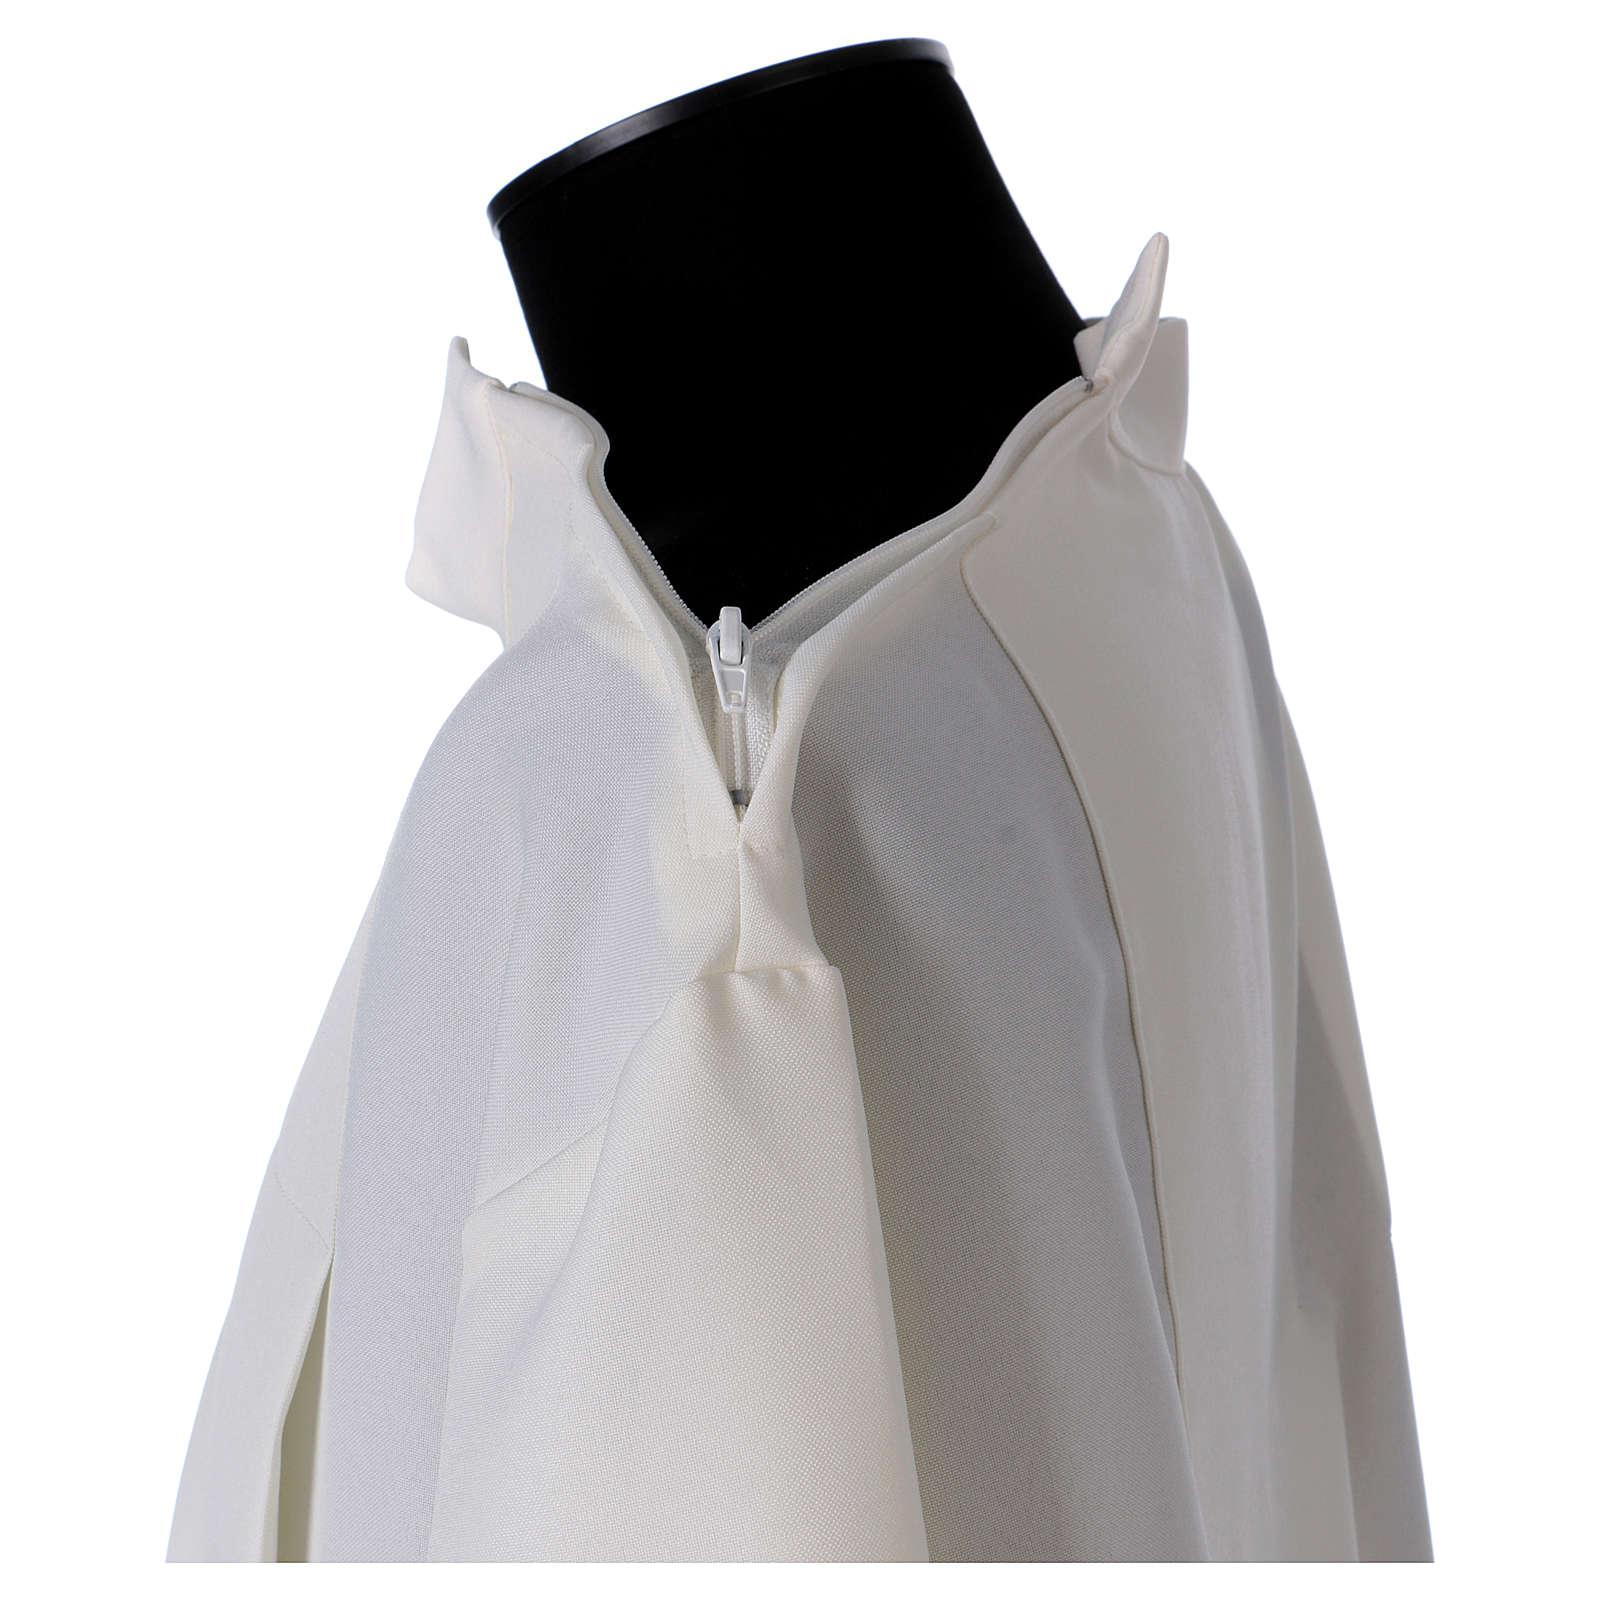 Alba marfil 100% poliéster dos pliegues cuello cremallera hombro 4